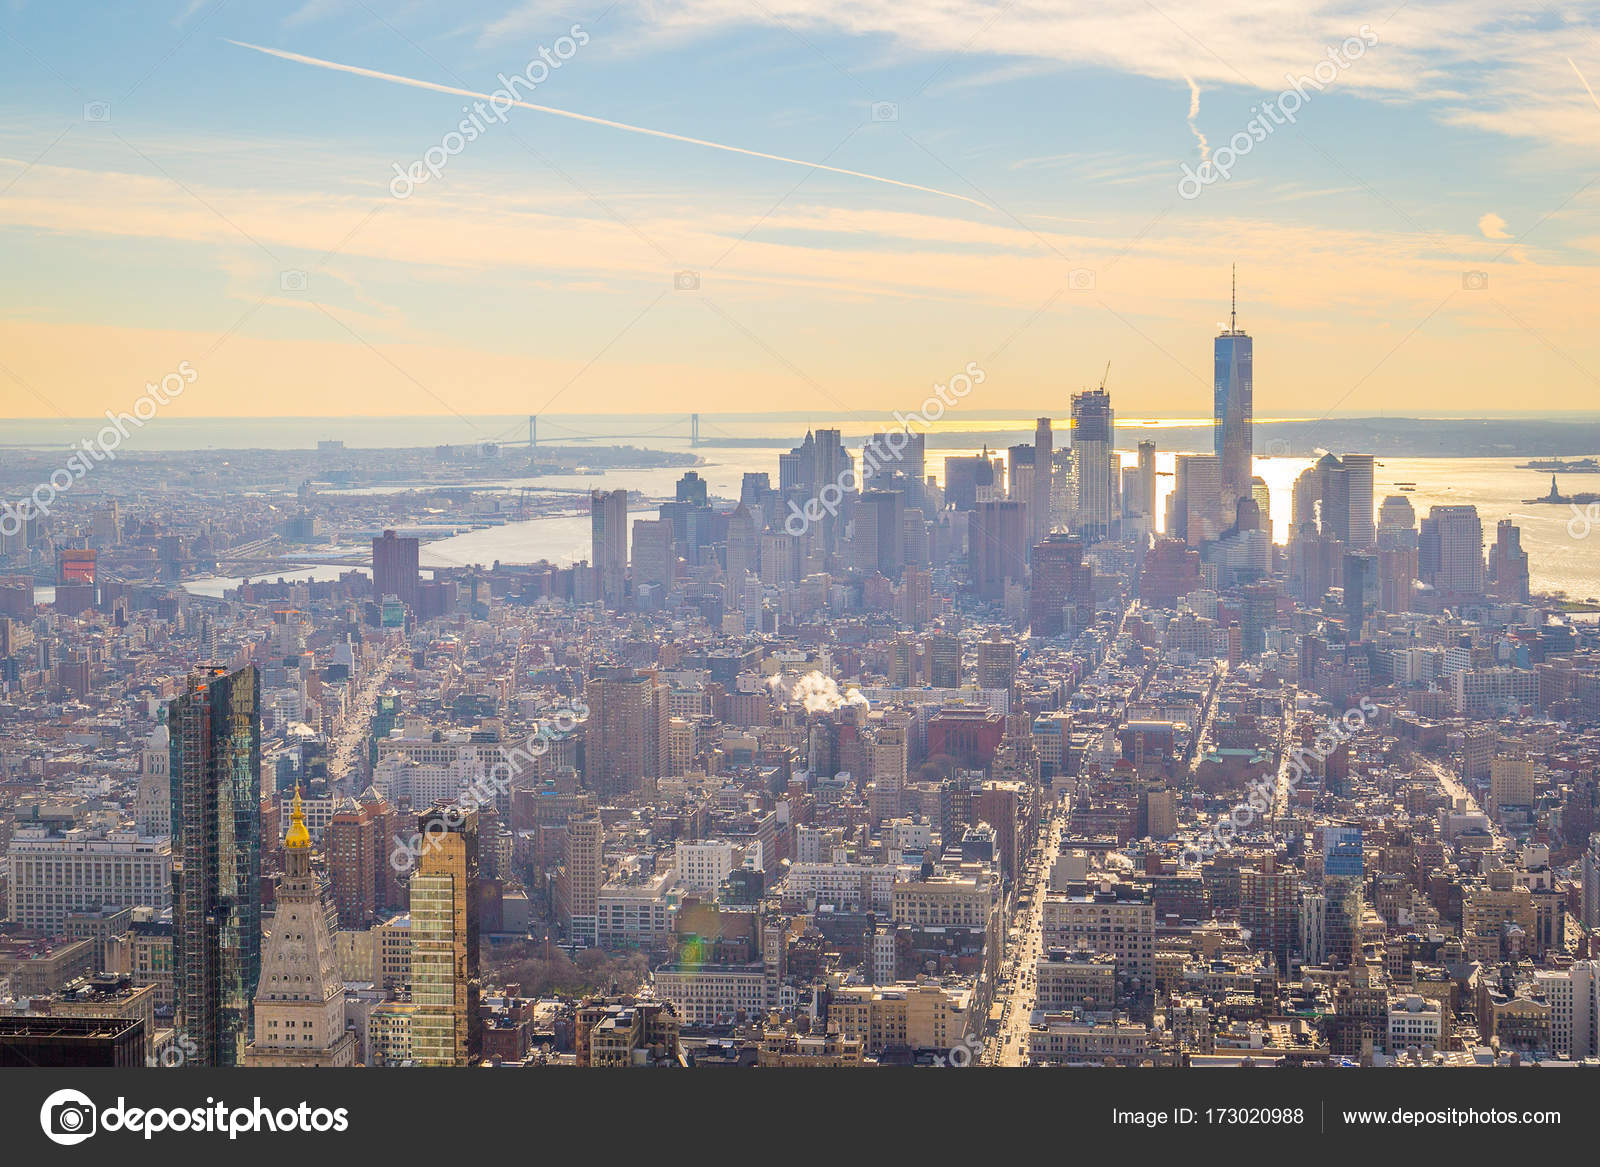 New York December 2016 Aerial Panoramic View City Stock Photo